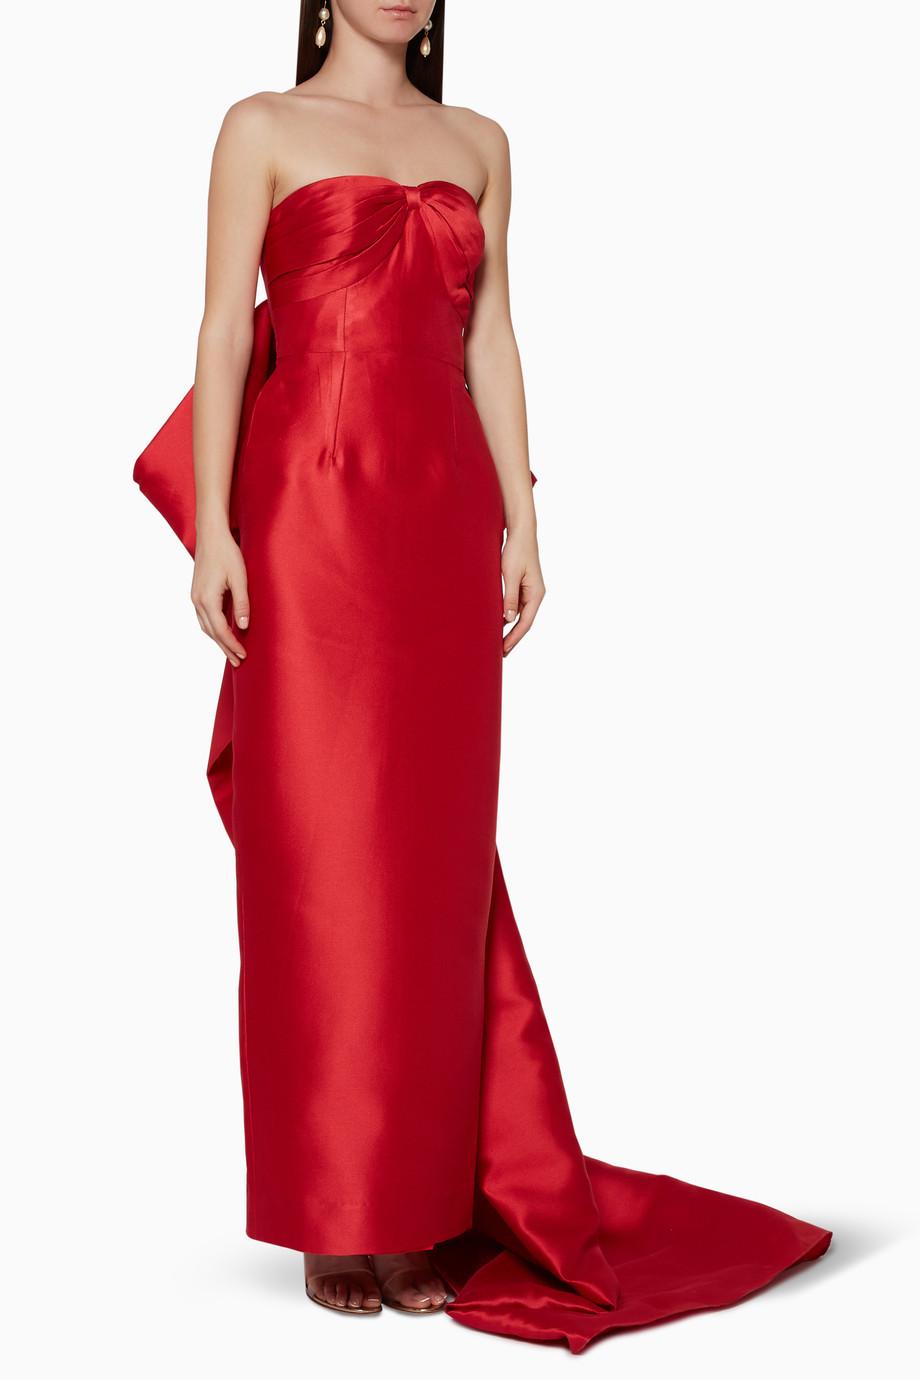 81cb02f0b تسوق فستان سهرة روبي ضيق أحمر بامبا بوتيك أحمر للنساء   اُناس الامارات